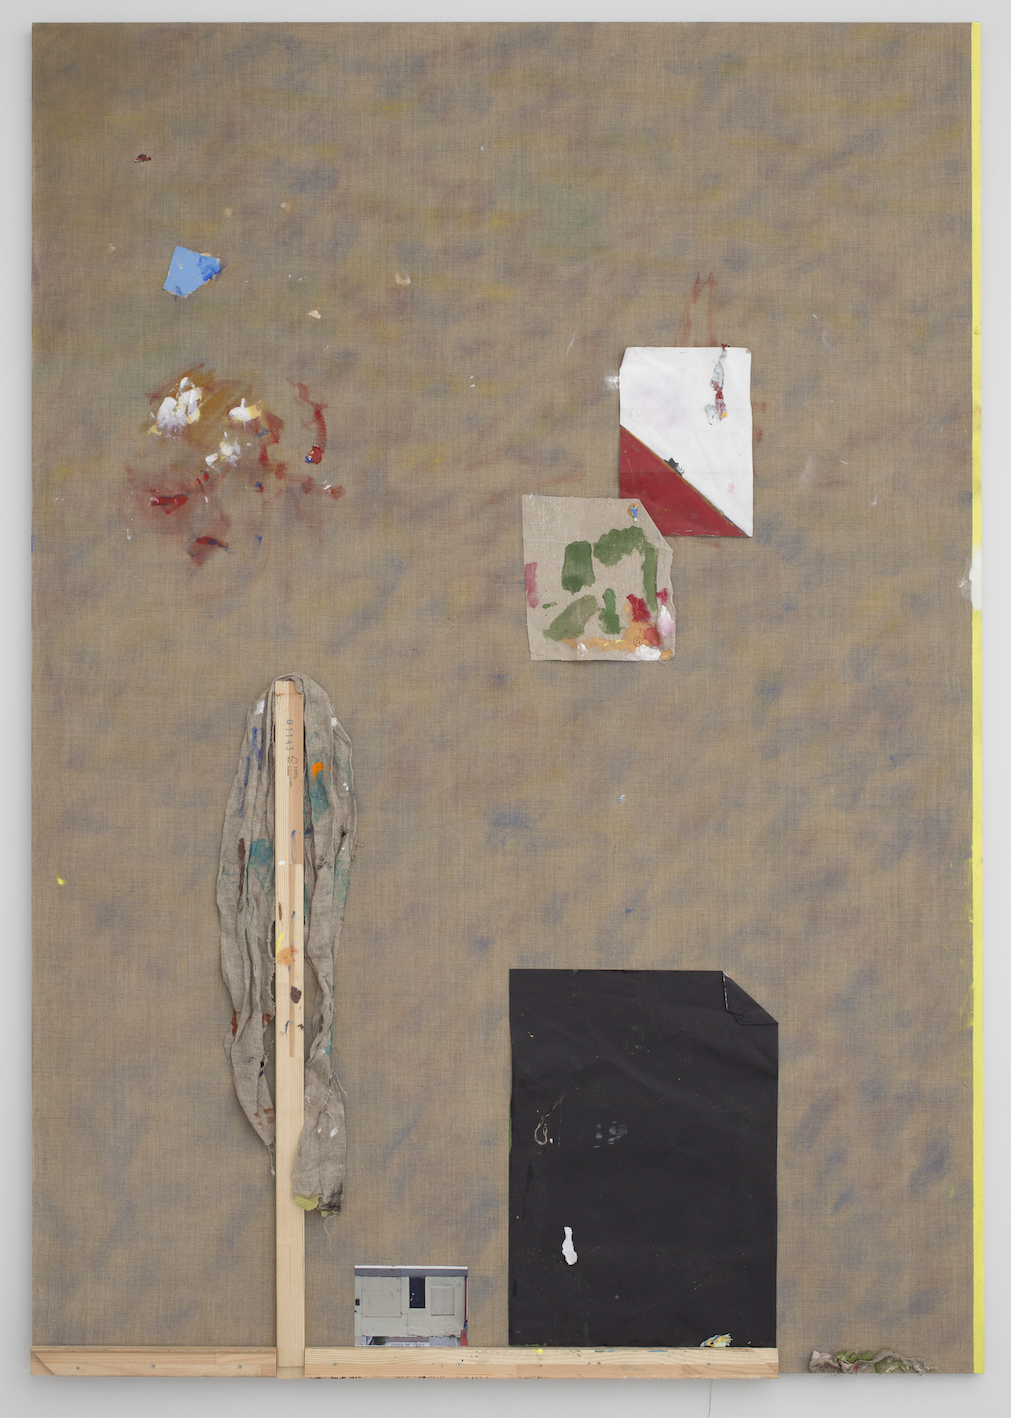 Untitled.  Acrylic, stretcher bars, paper, photograph, staples & linen, 150x213cm, 2015.